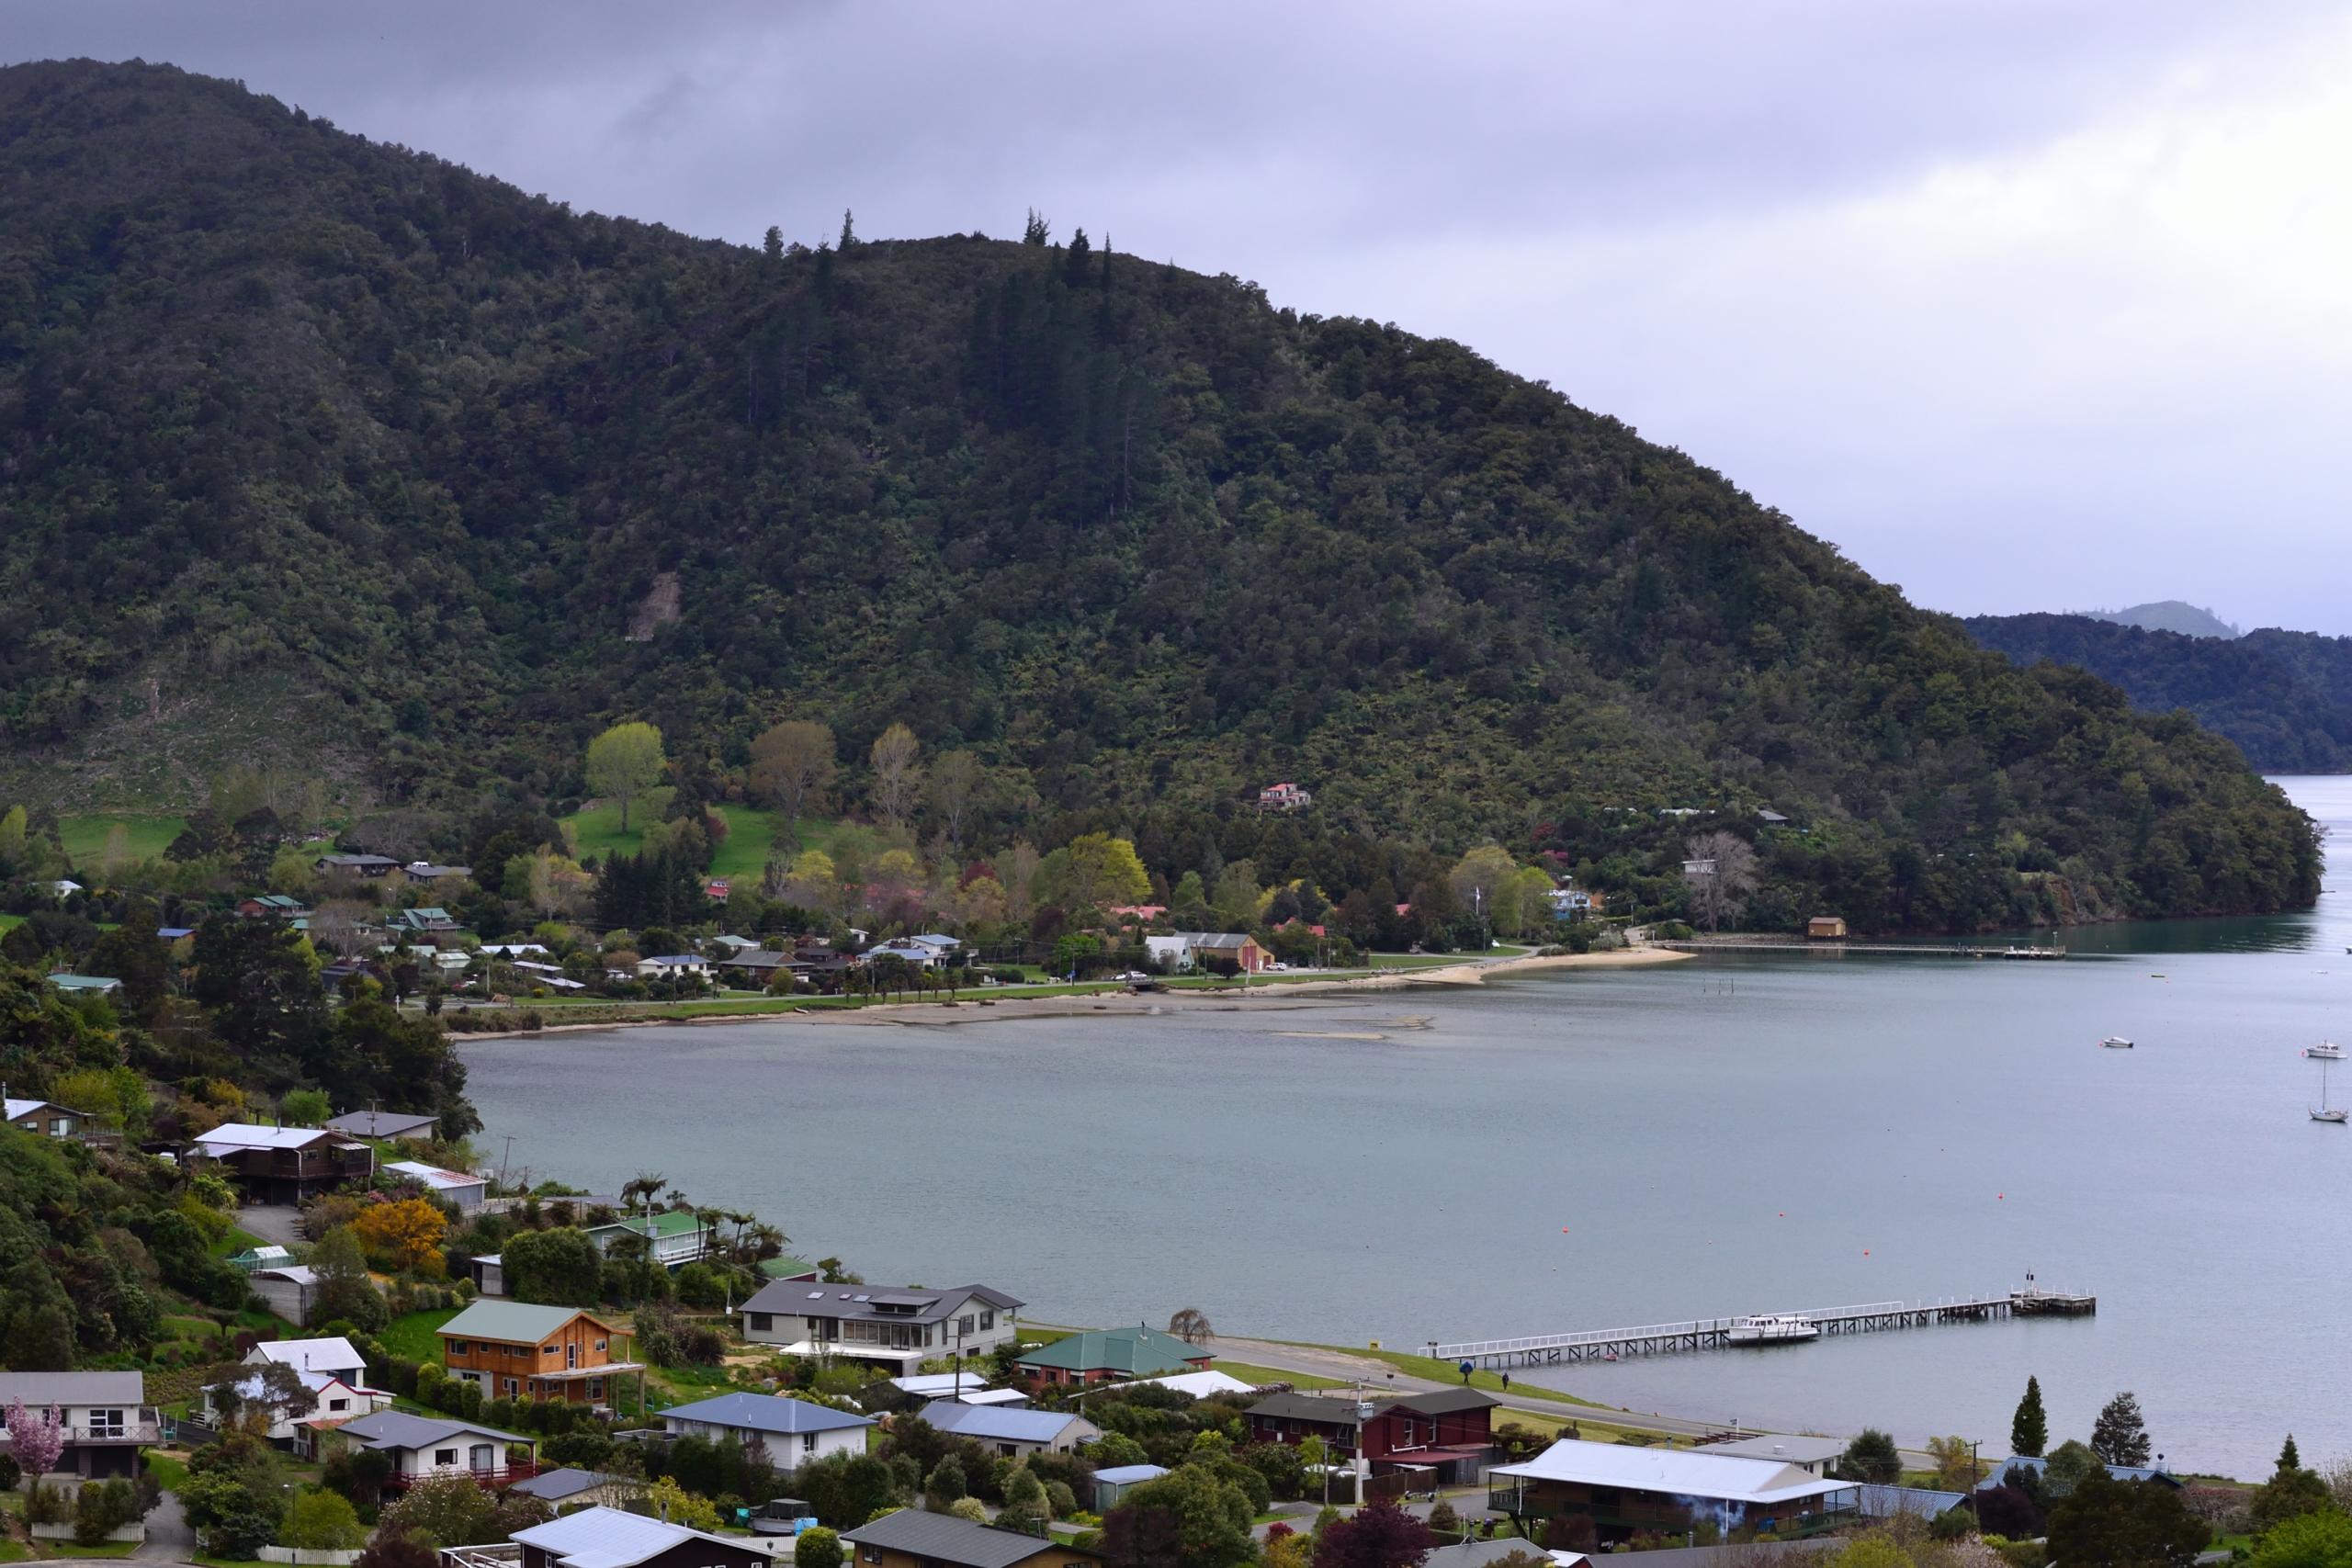 New Zealand Wikipedia: File:Anakiwa, New Zealand.jpg